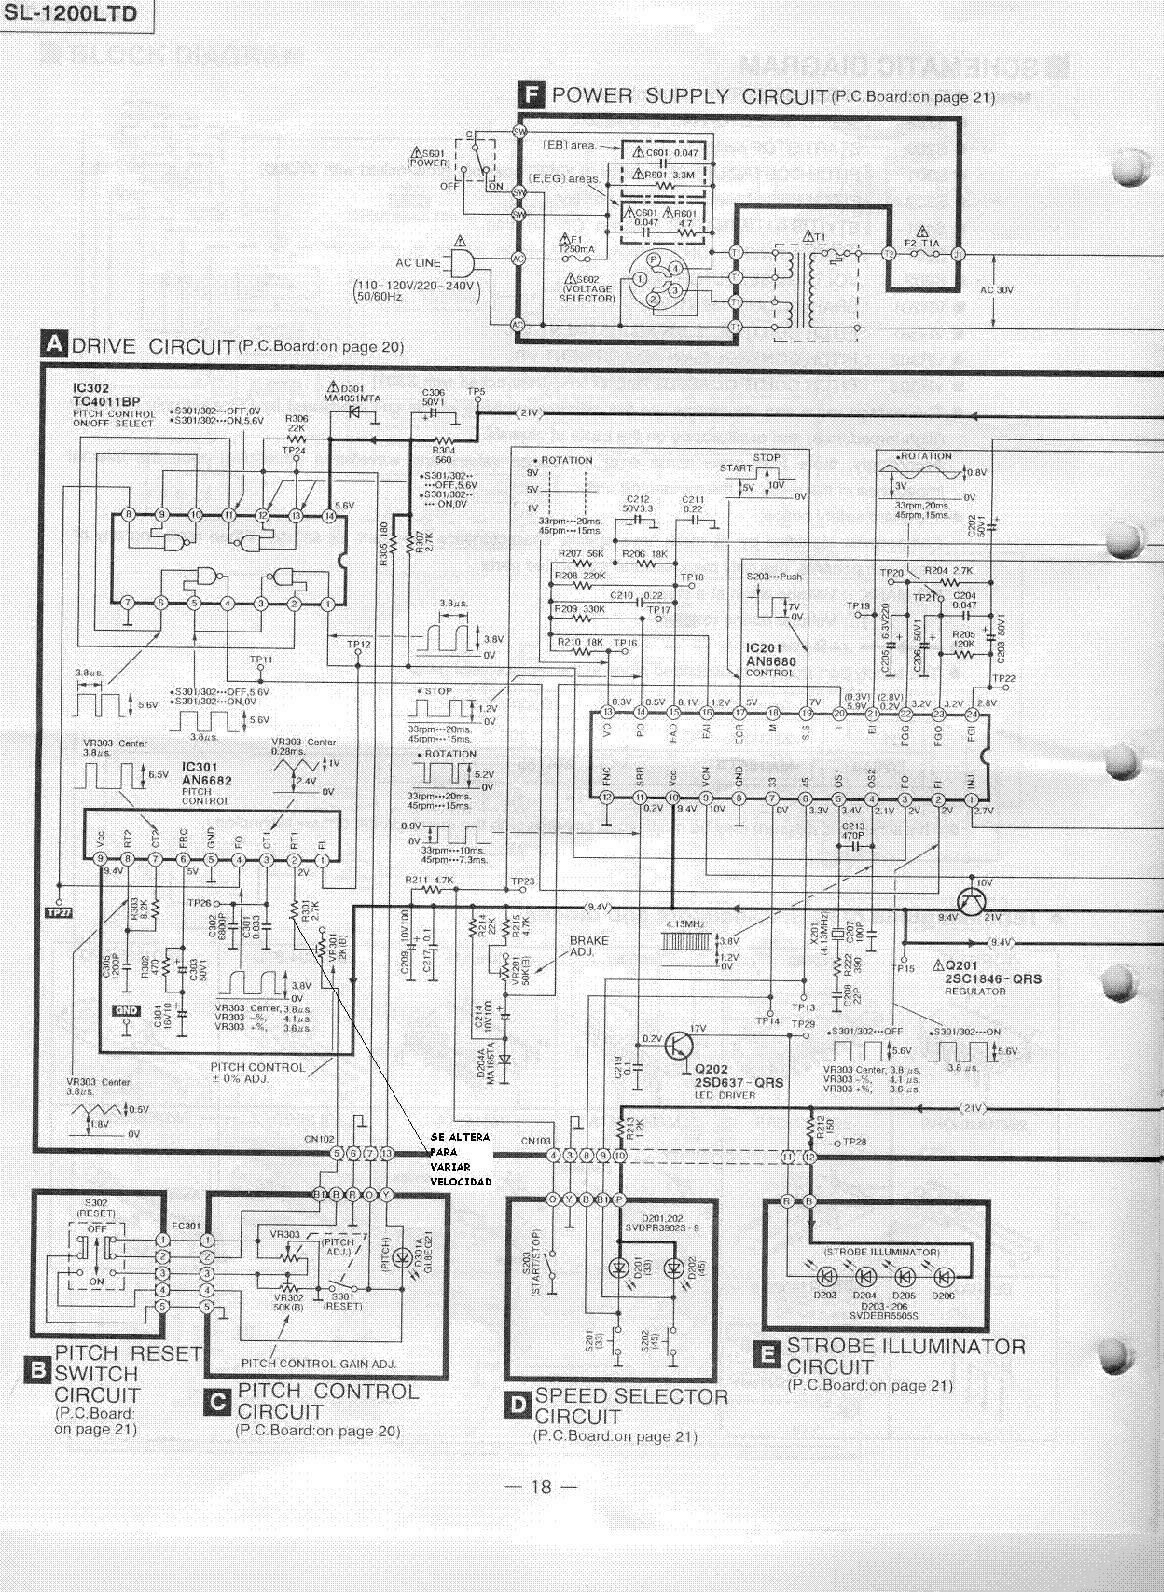 TECHNICS SL-1200LTD SCH Service Manual download ...